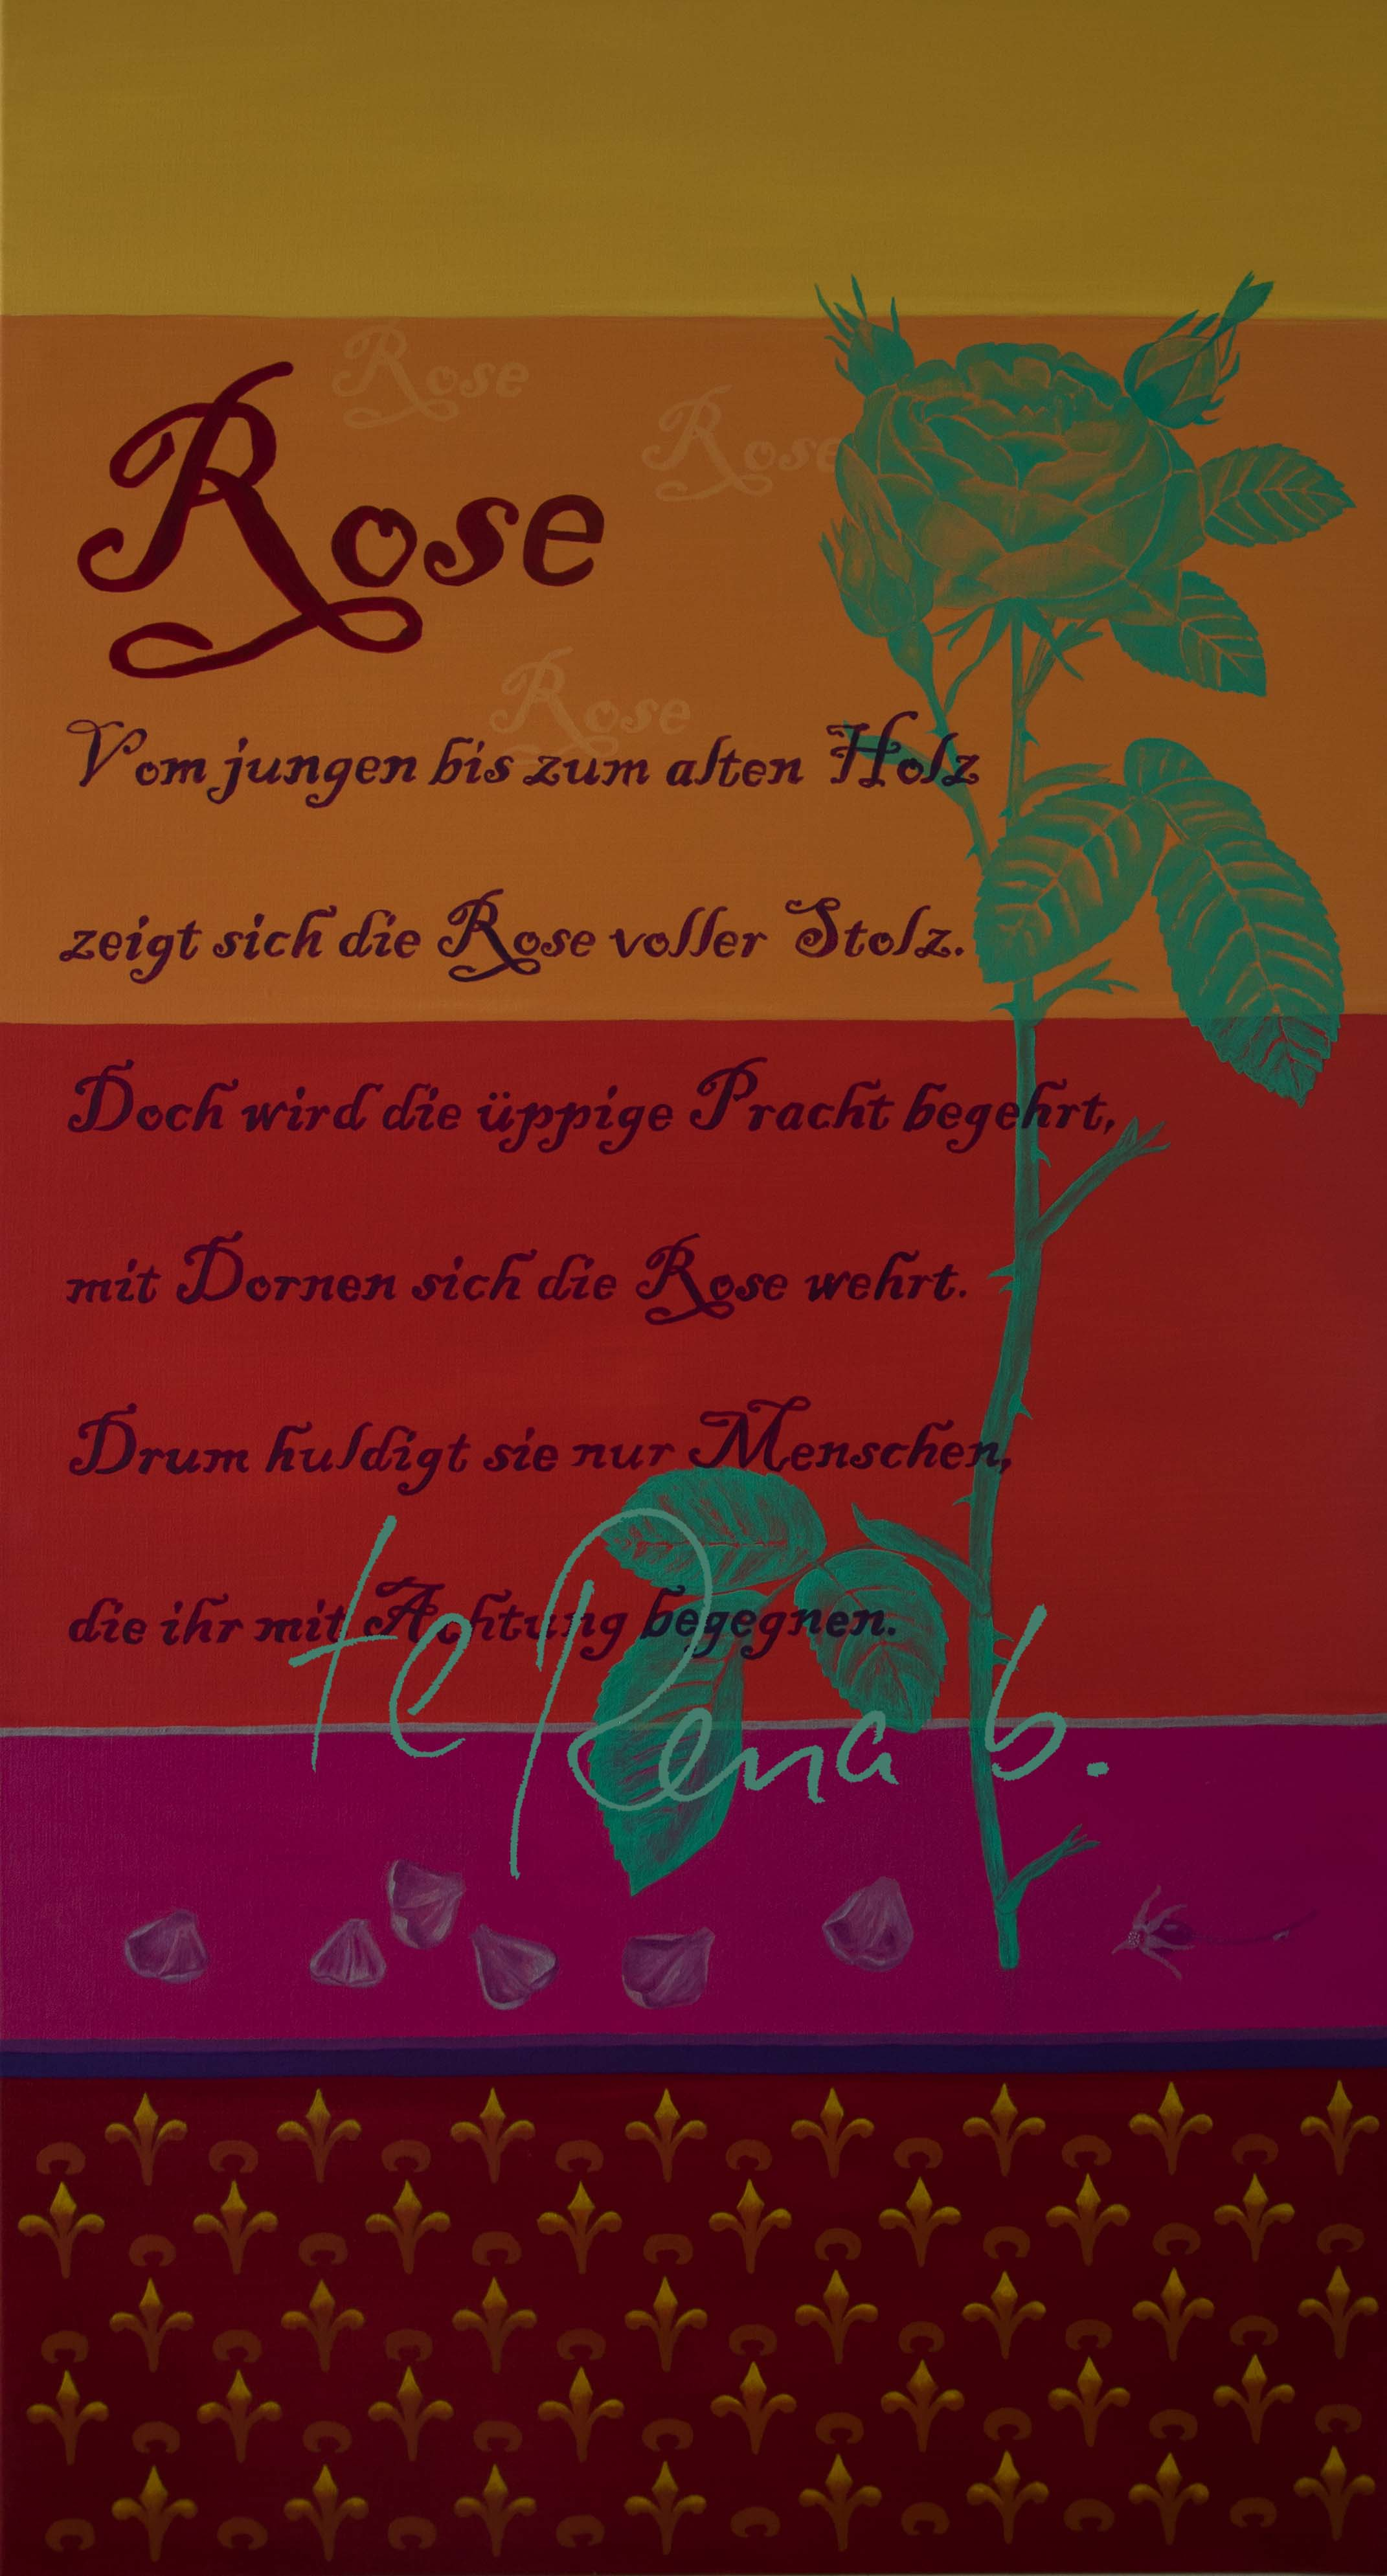 Poesie der Rose I